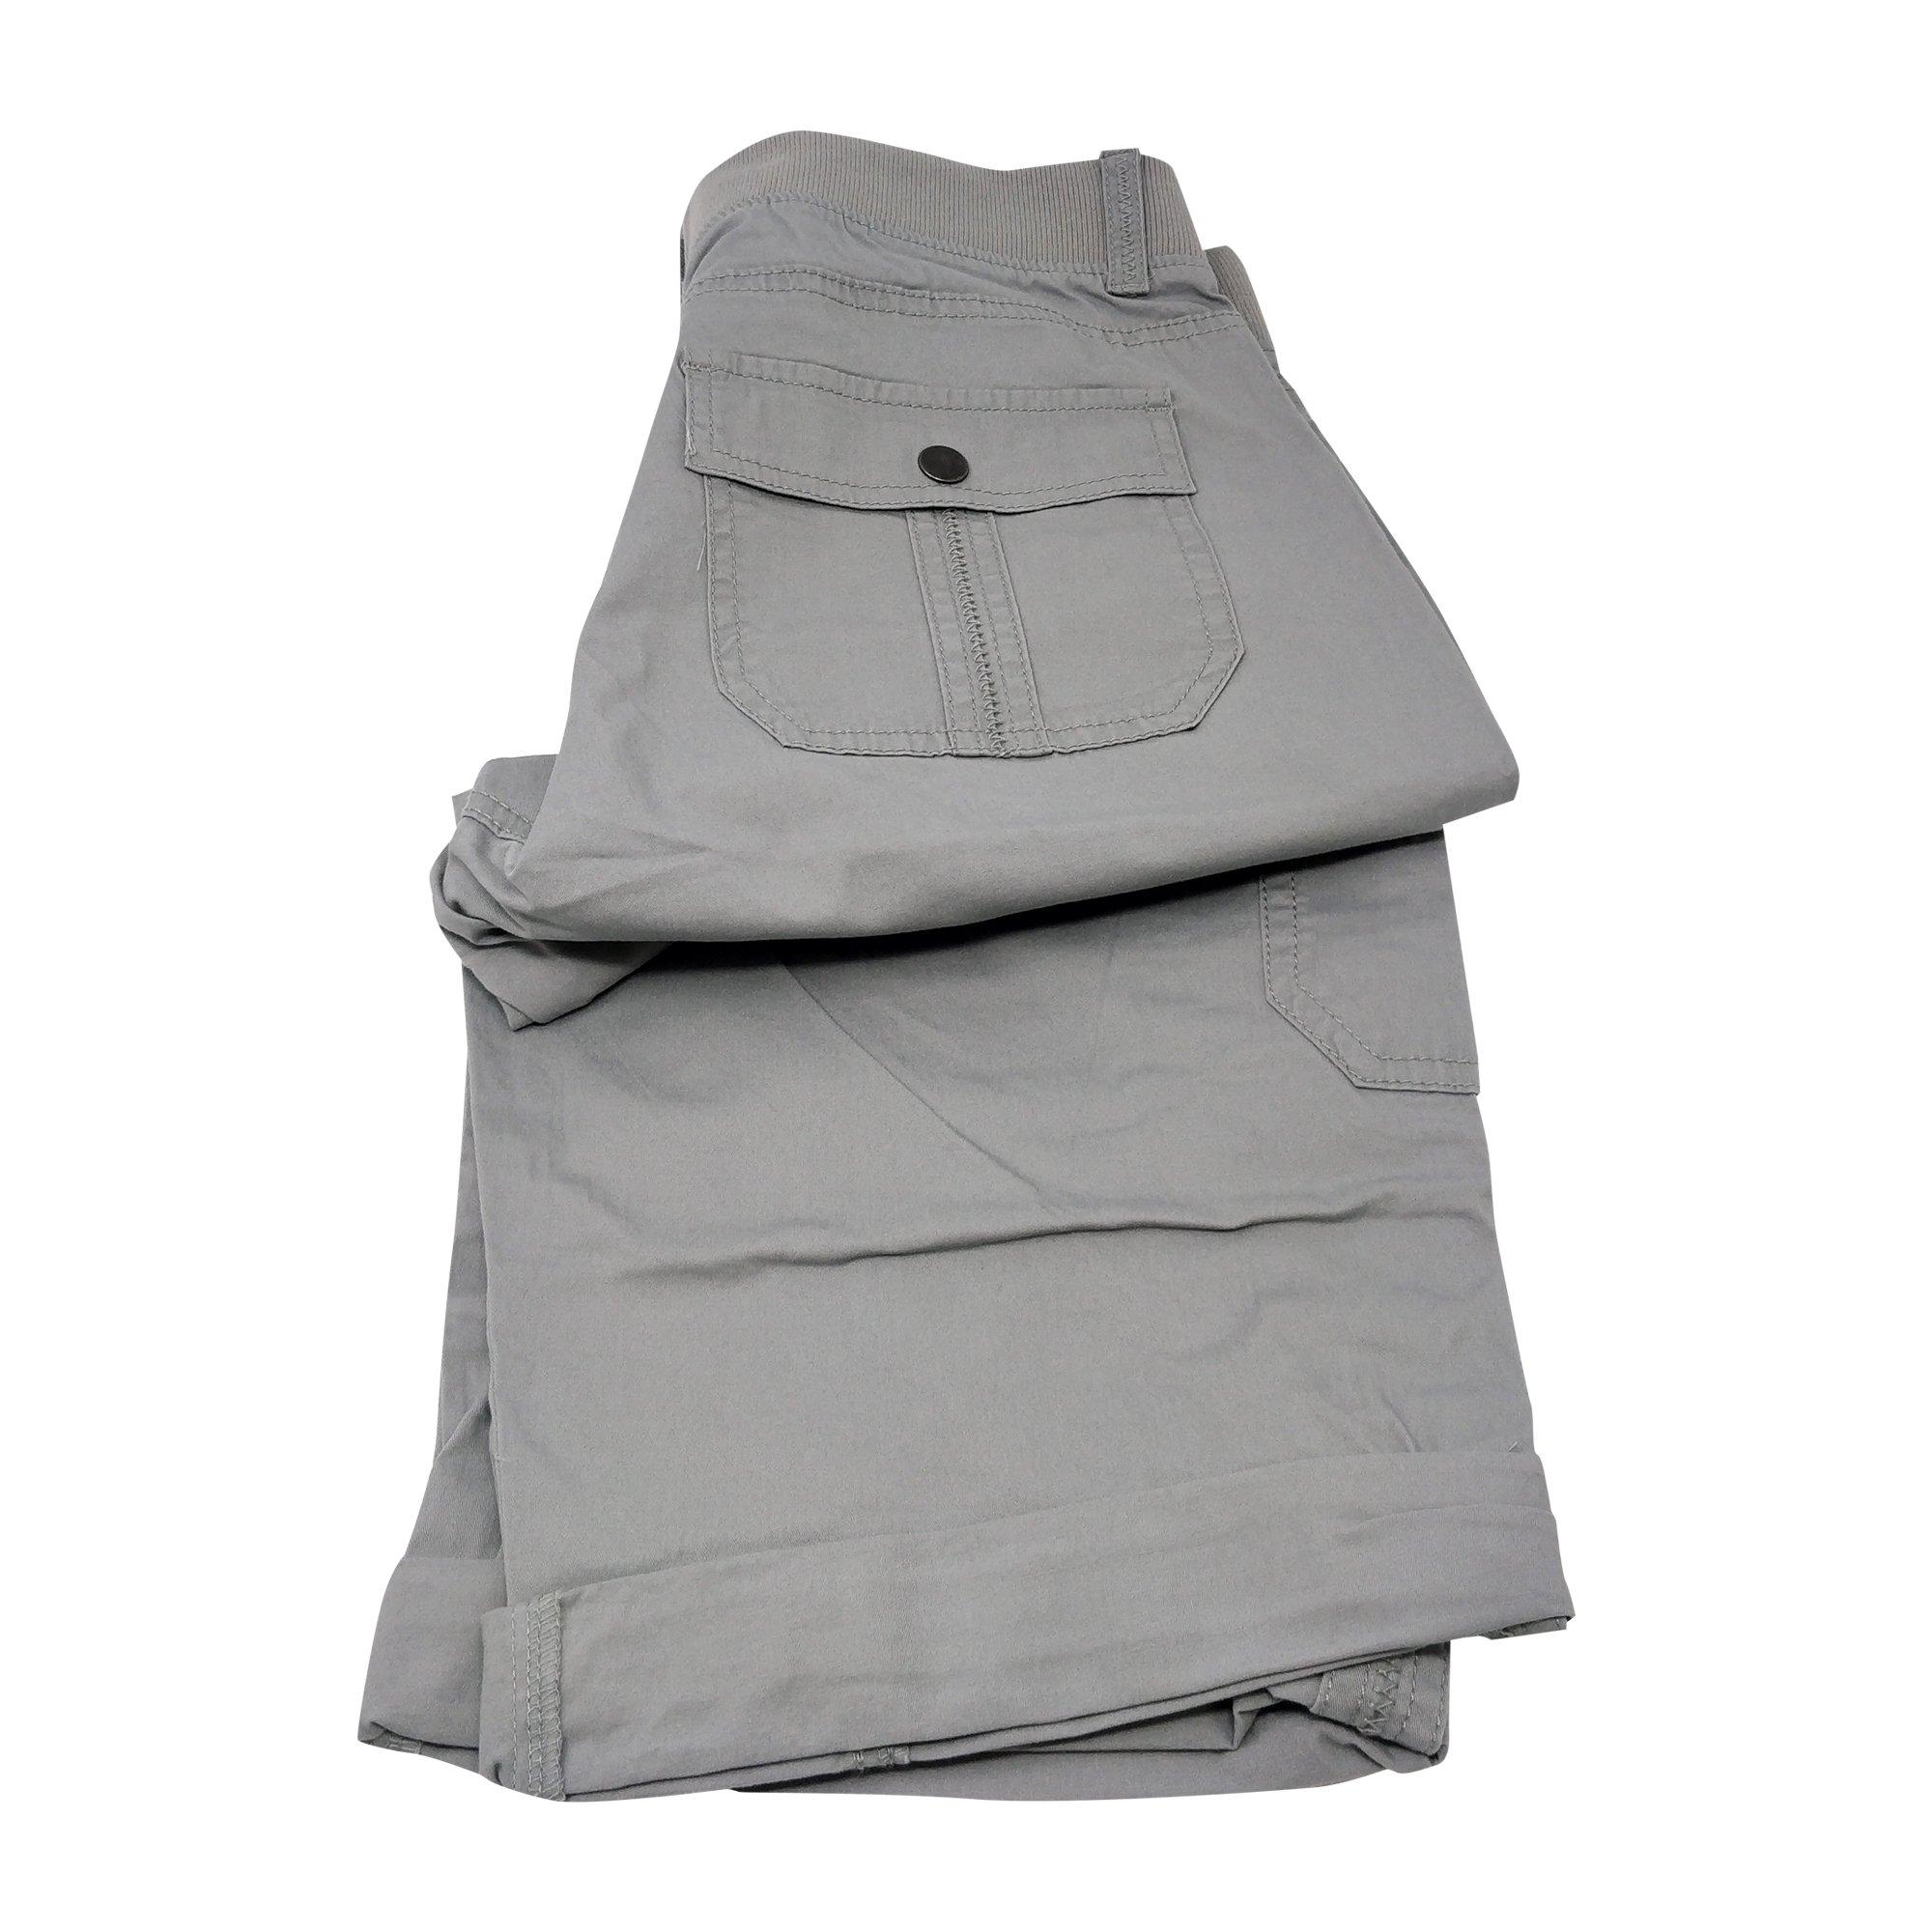 LEE Women's Relaxed Fit Skye Knit Waist Cargo Capri Pant (18, Alloy)